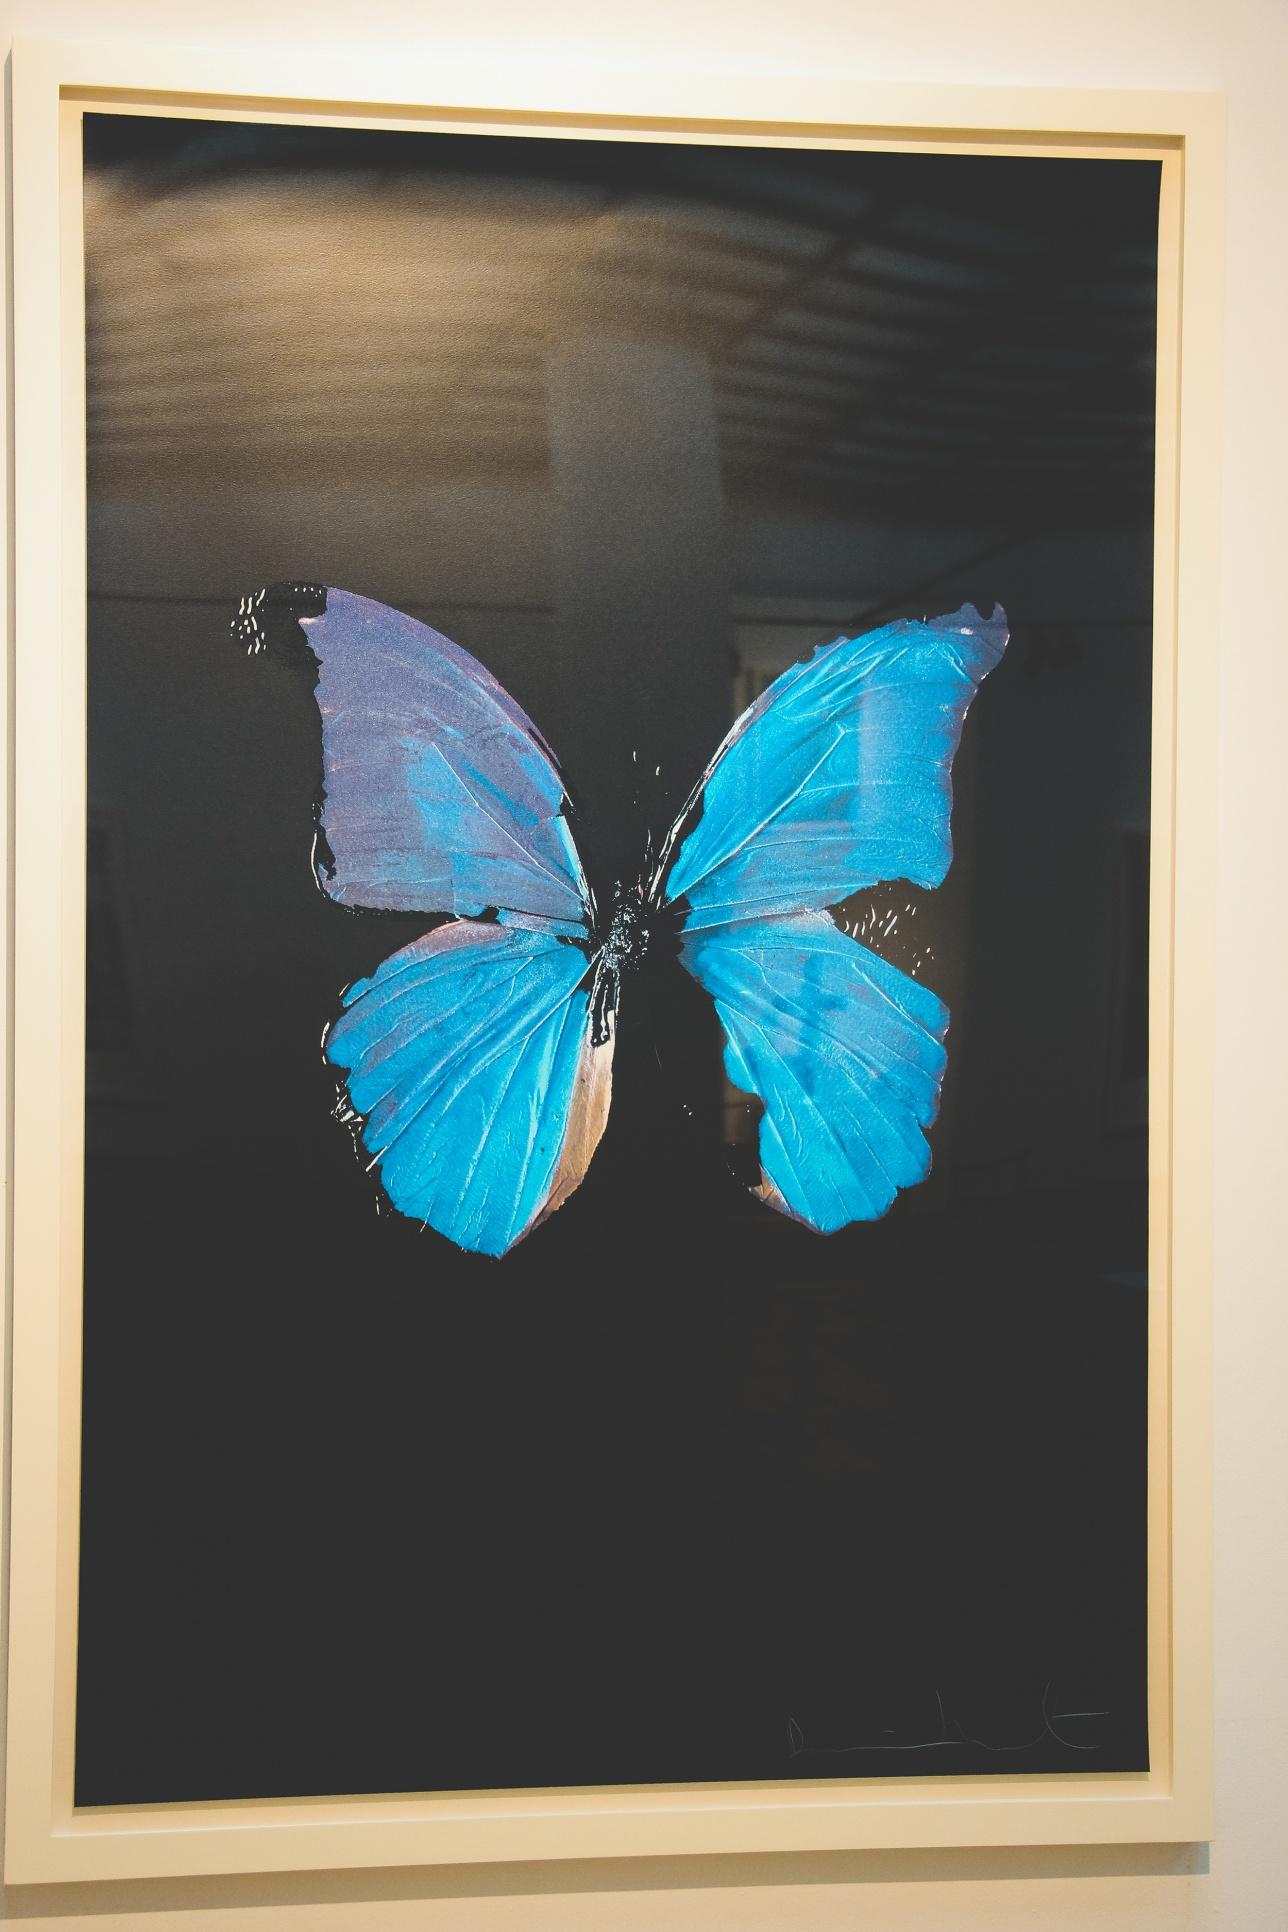 Синяя бабочка на чёрном фоне Дэмиена Хёрста